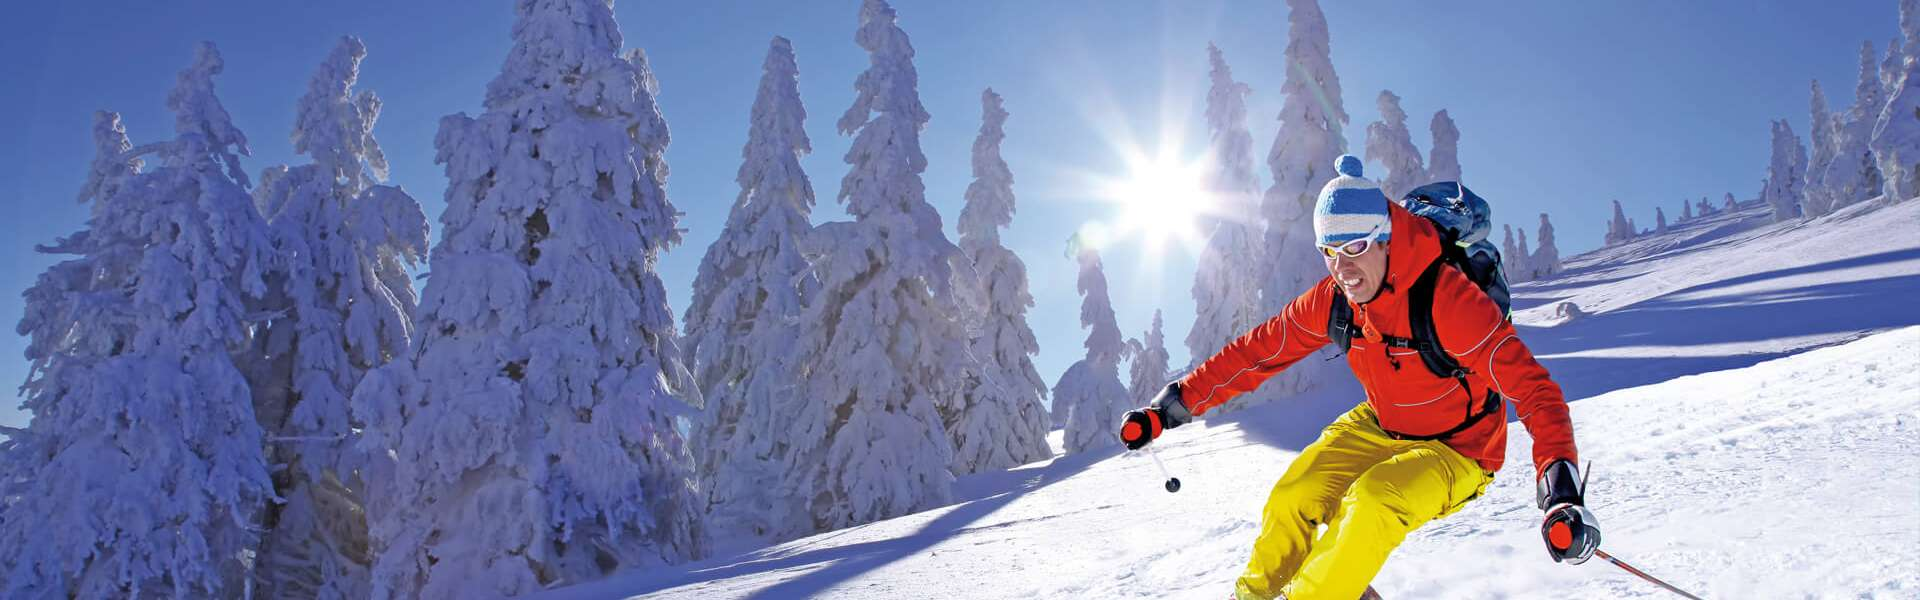 Singlereis Wintersport Oud en Nieuw